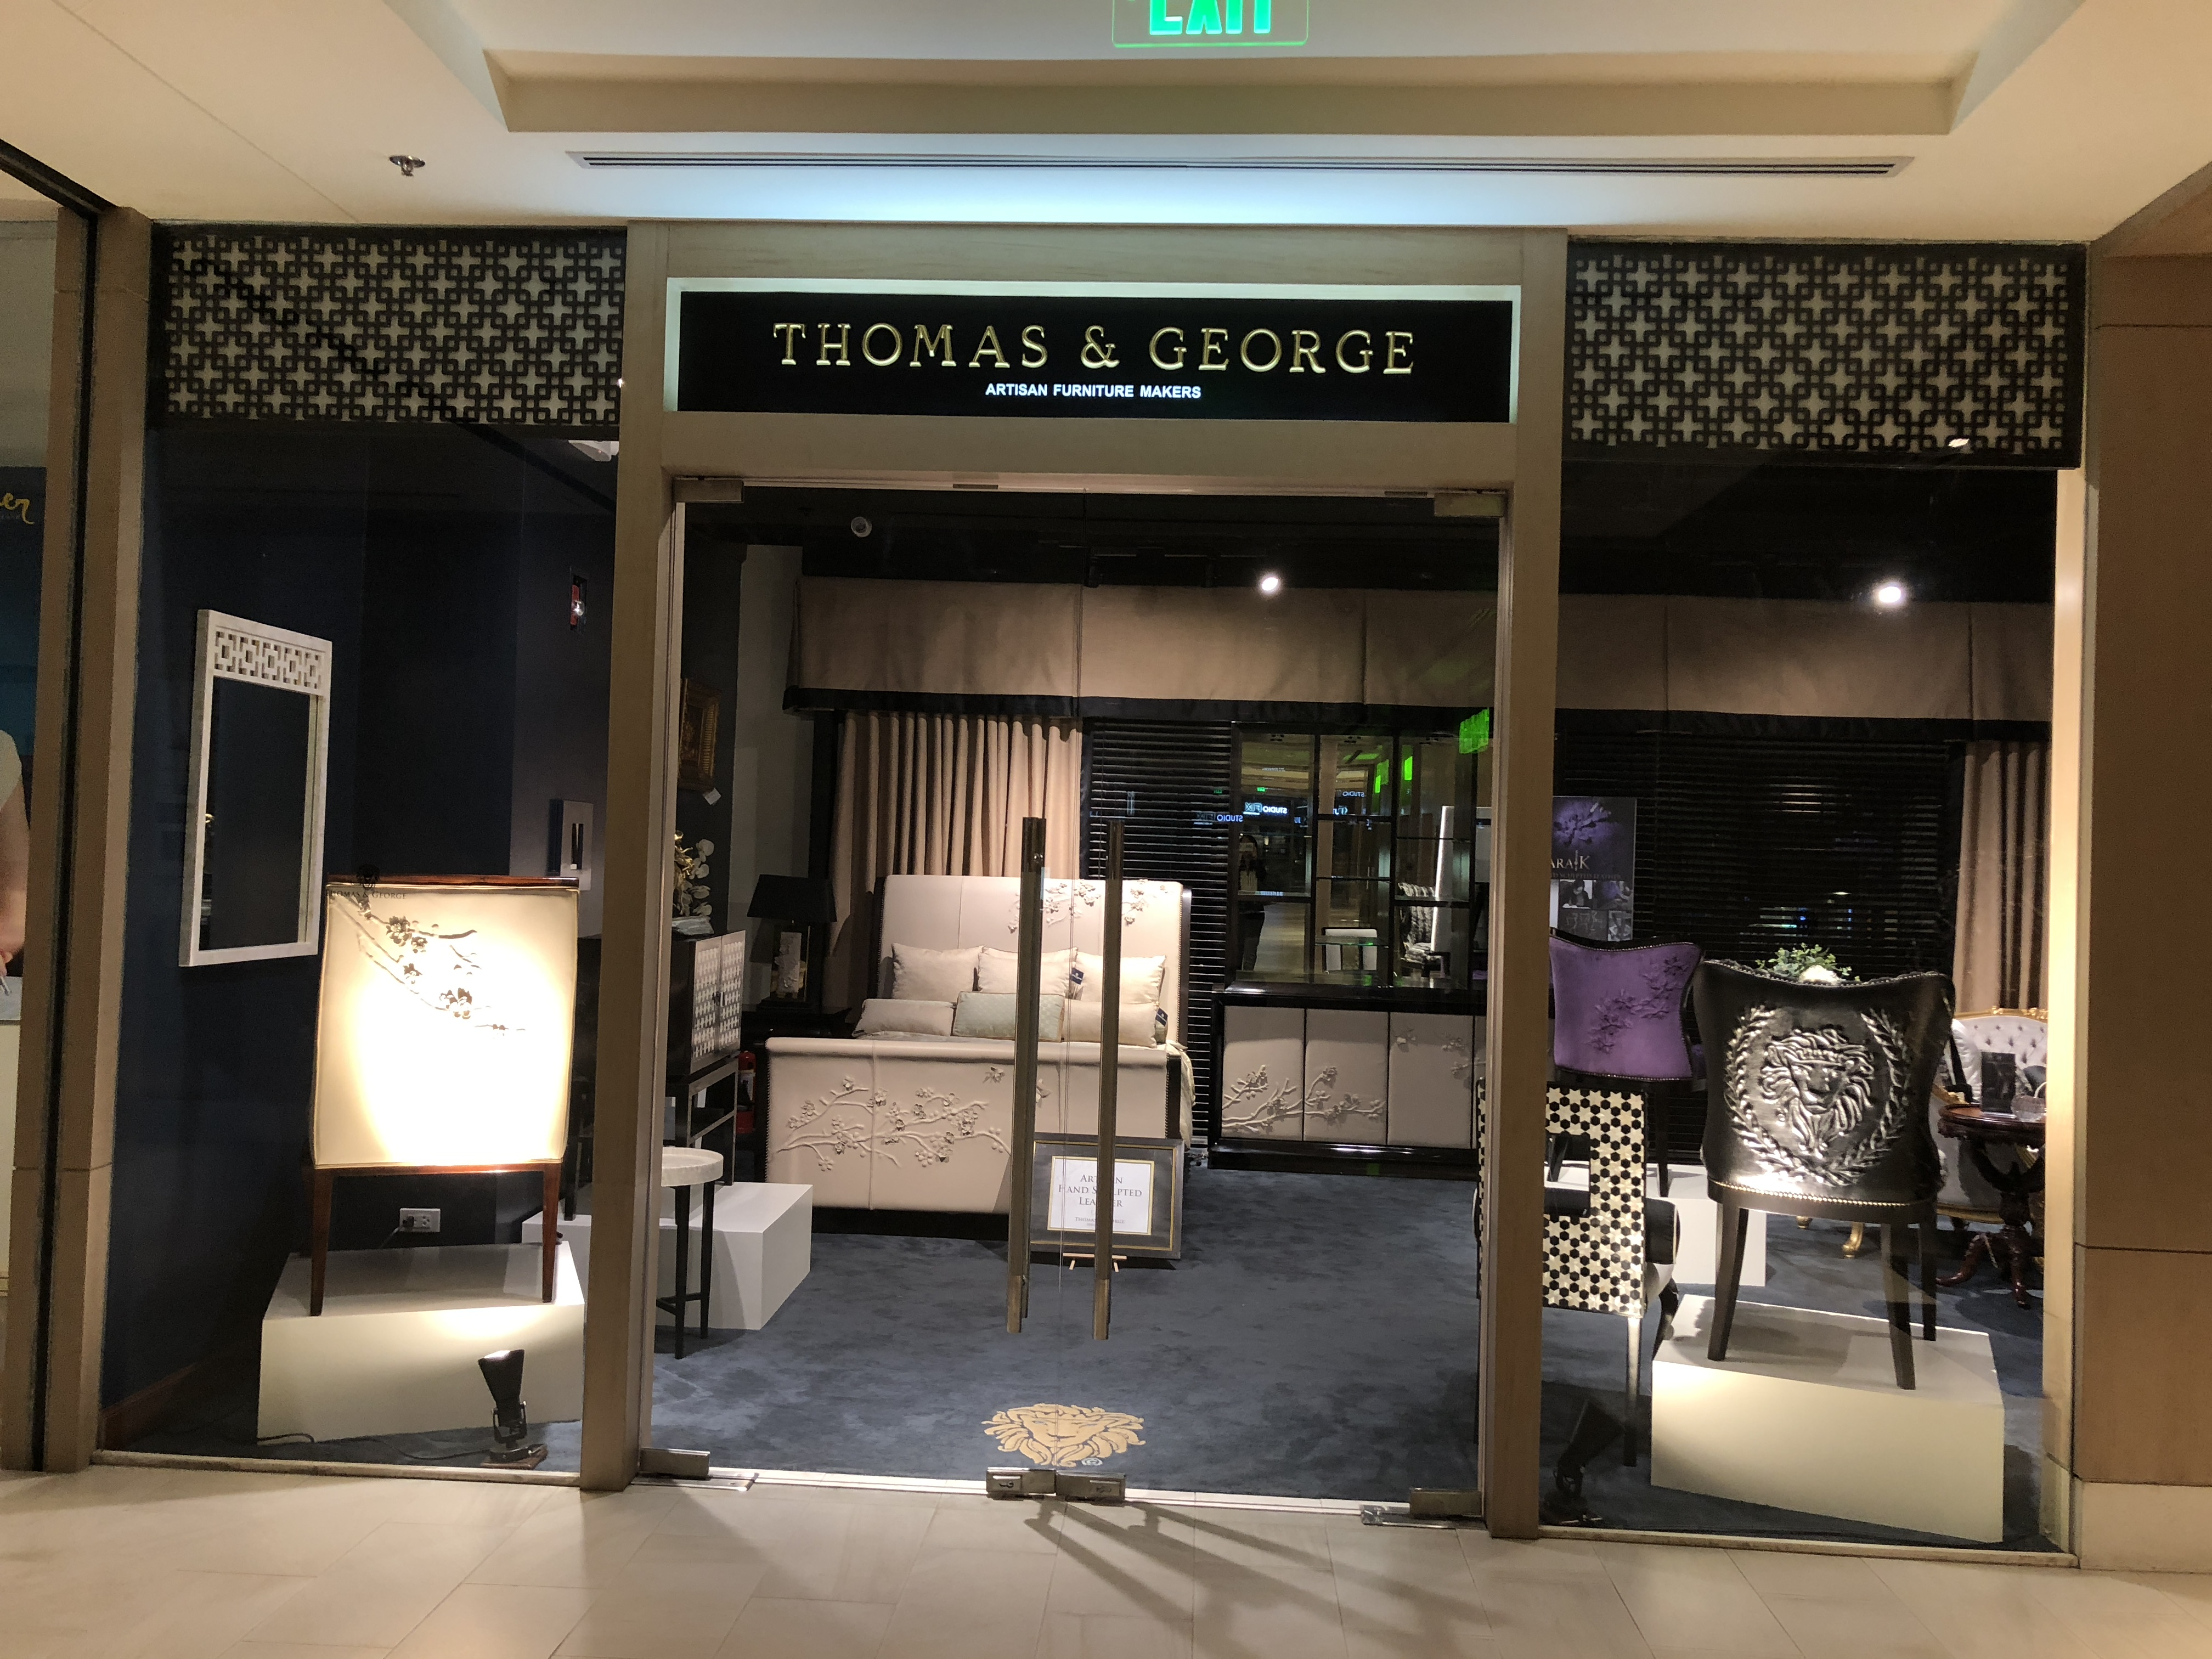 Retail Sales & Marketing from Thomas & George Fine Furniture Inc.